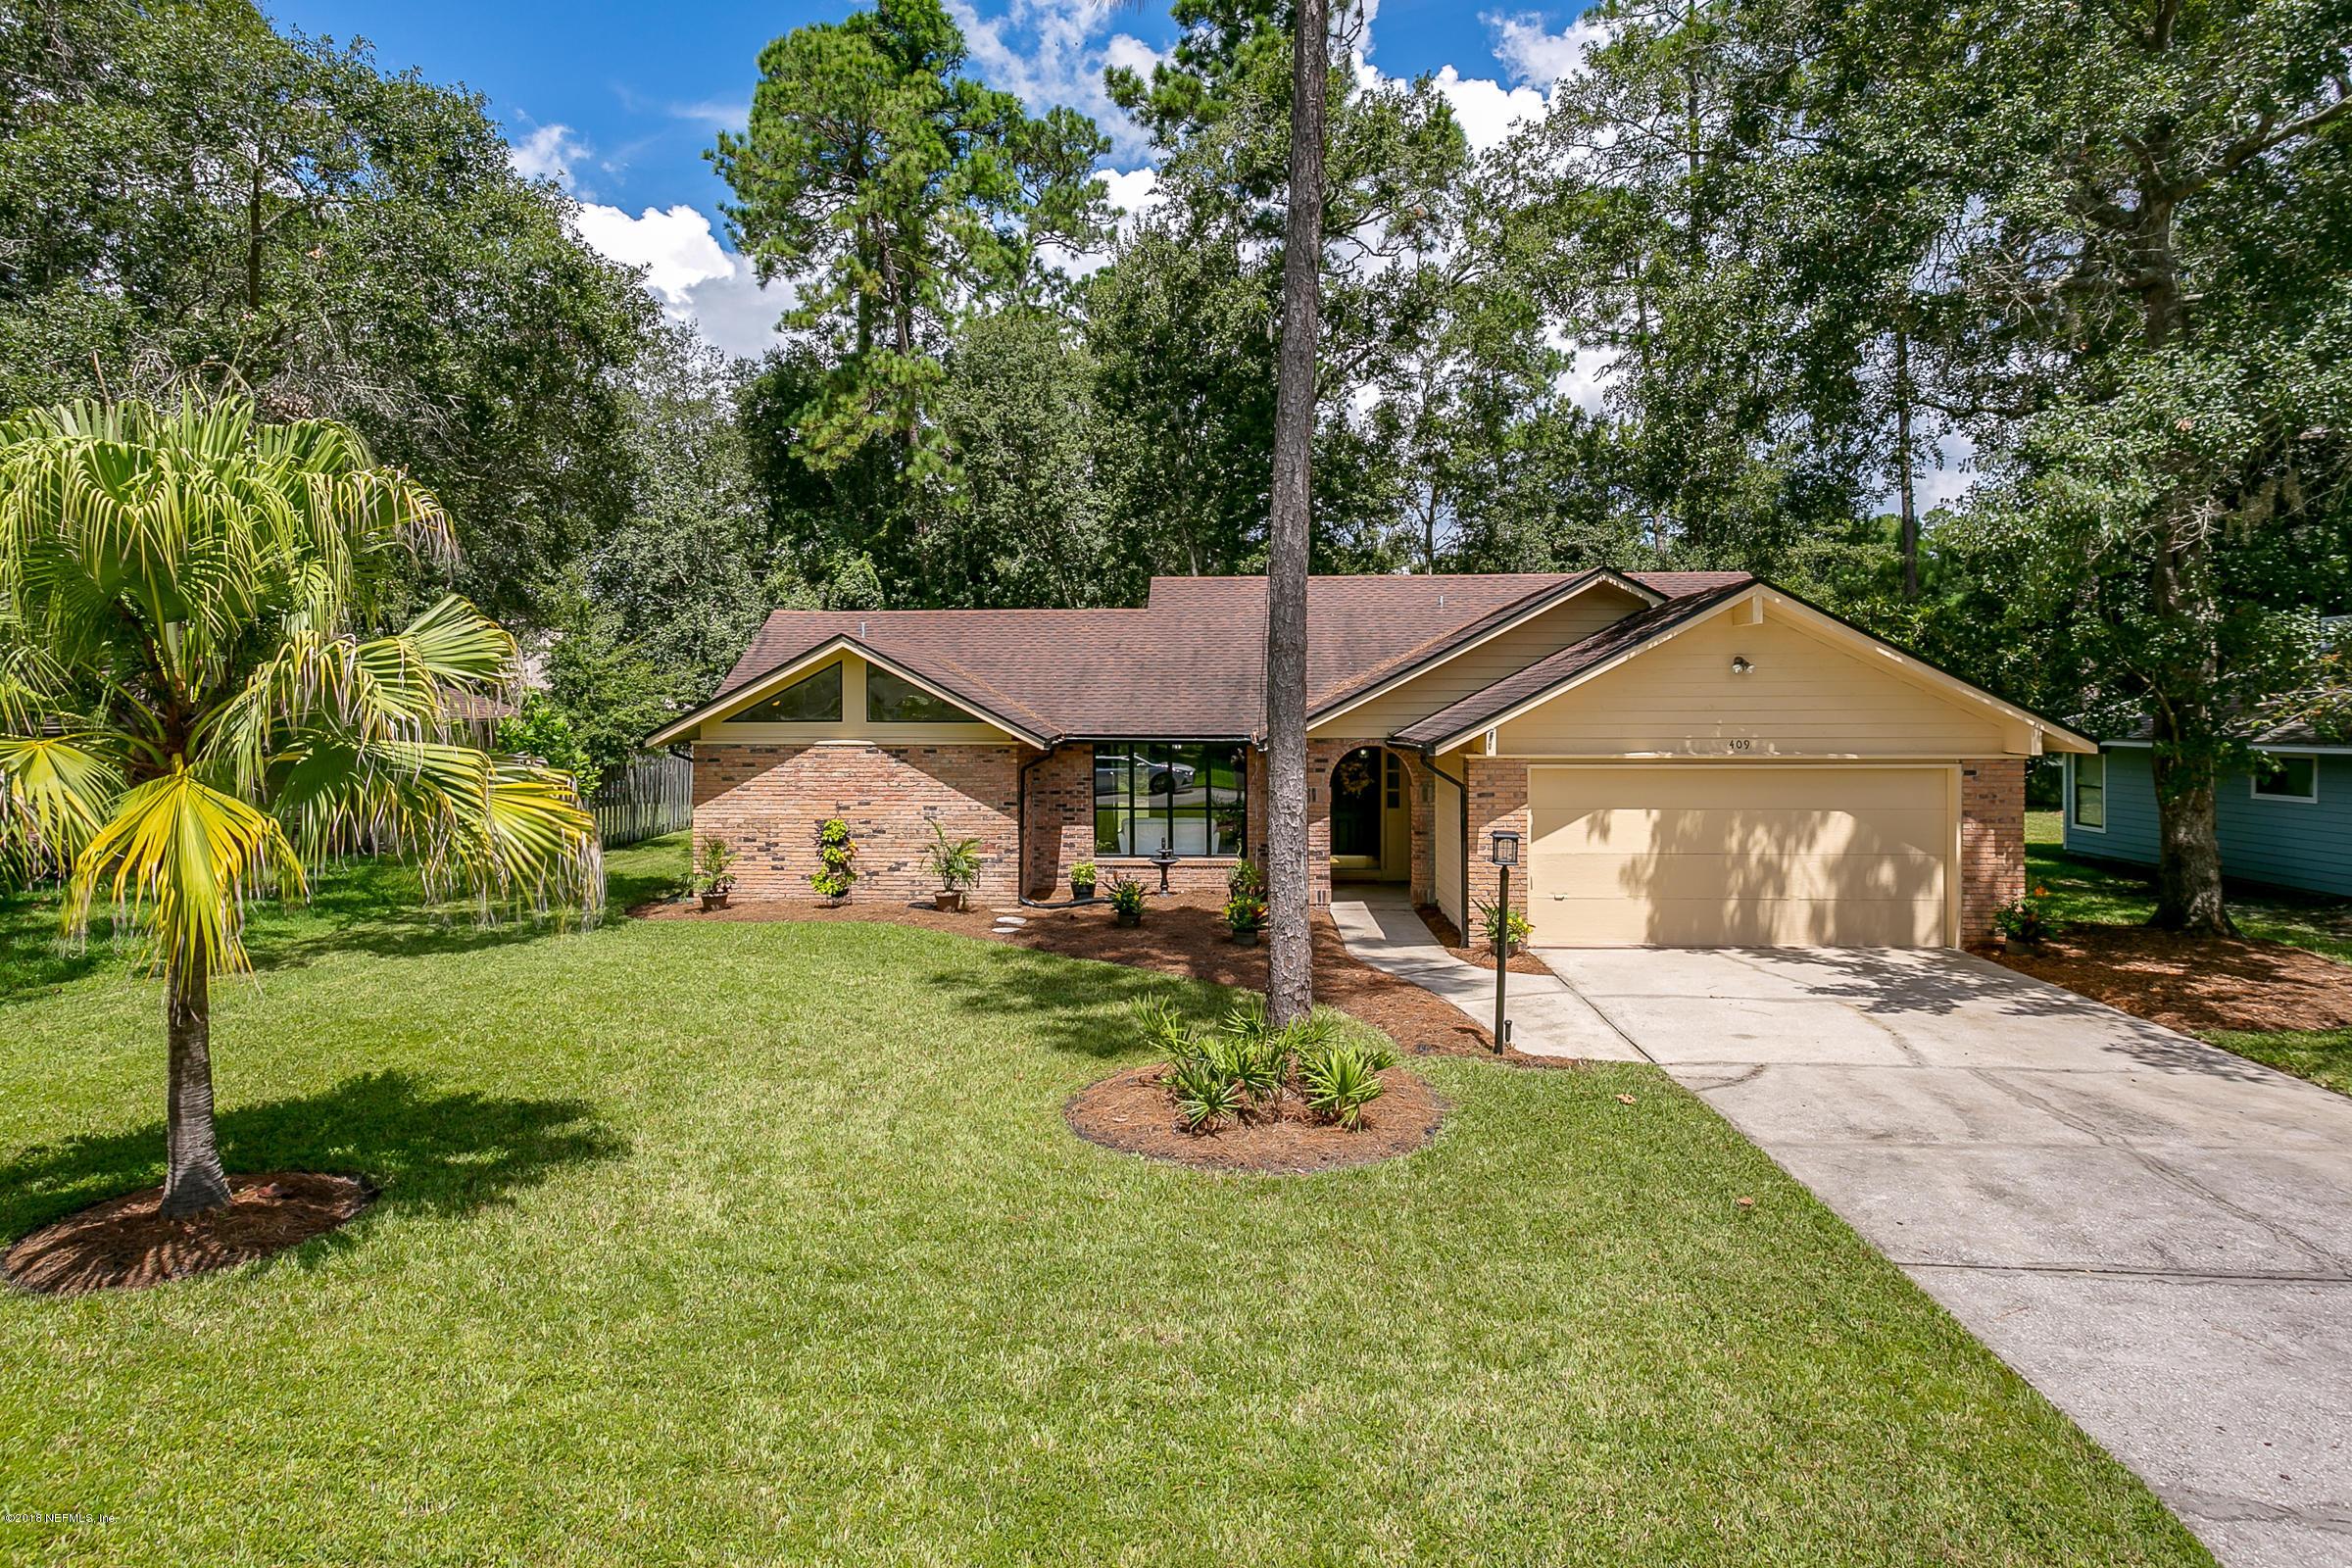 409 HARVEST BEND, FLEMING ISLAND, FLORIDA 32003, 3 Bedrooms Bedrooms, ,2 BathroomsBathrooms,Residential - single family,For sale,HARVEST BEND,956741